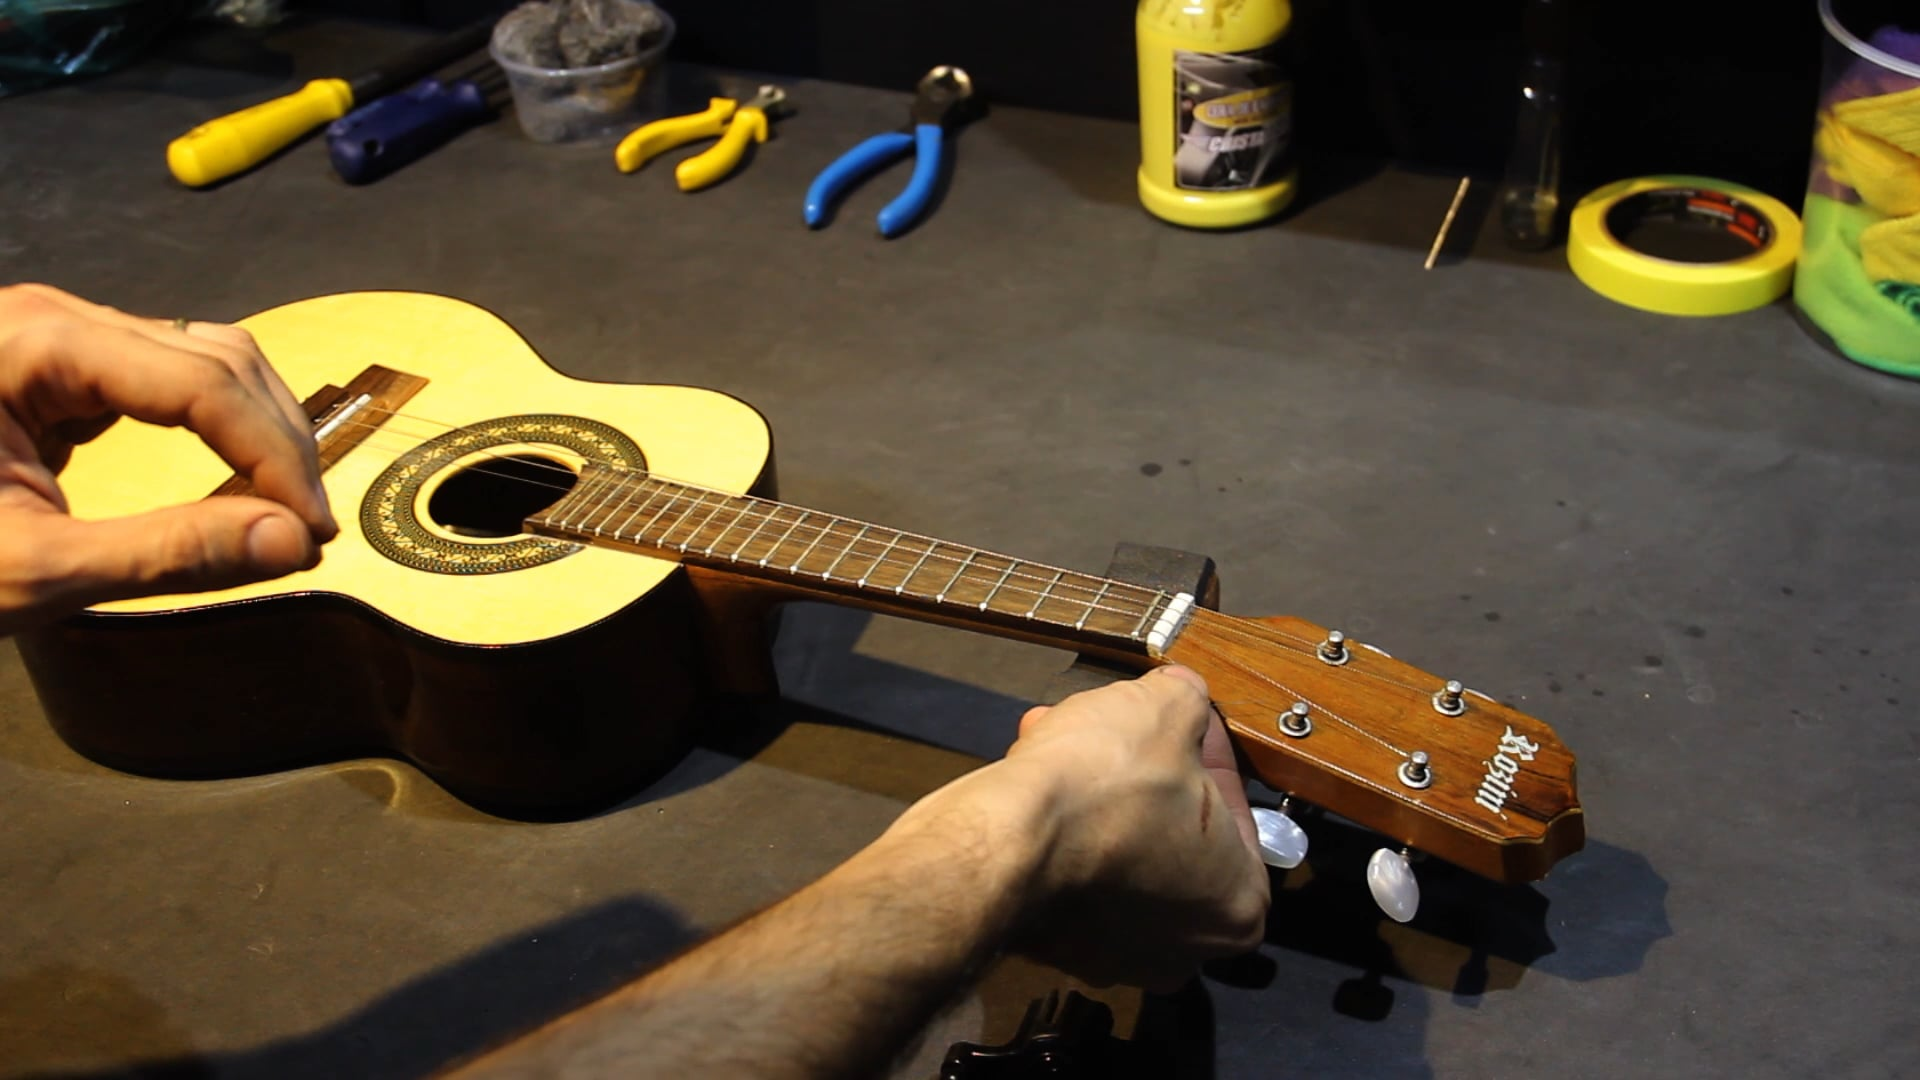 Limpeza e Troca de Cordas para Instrumentos Acústicos - Parte 3